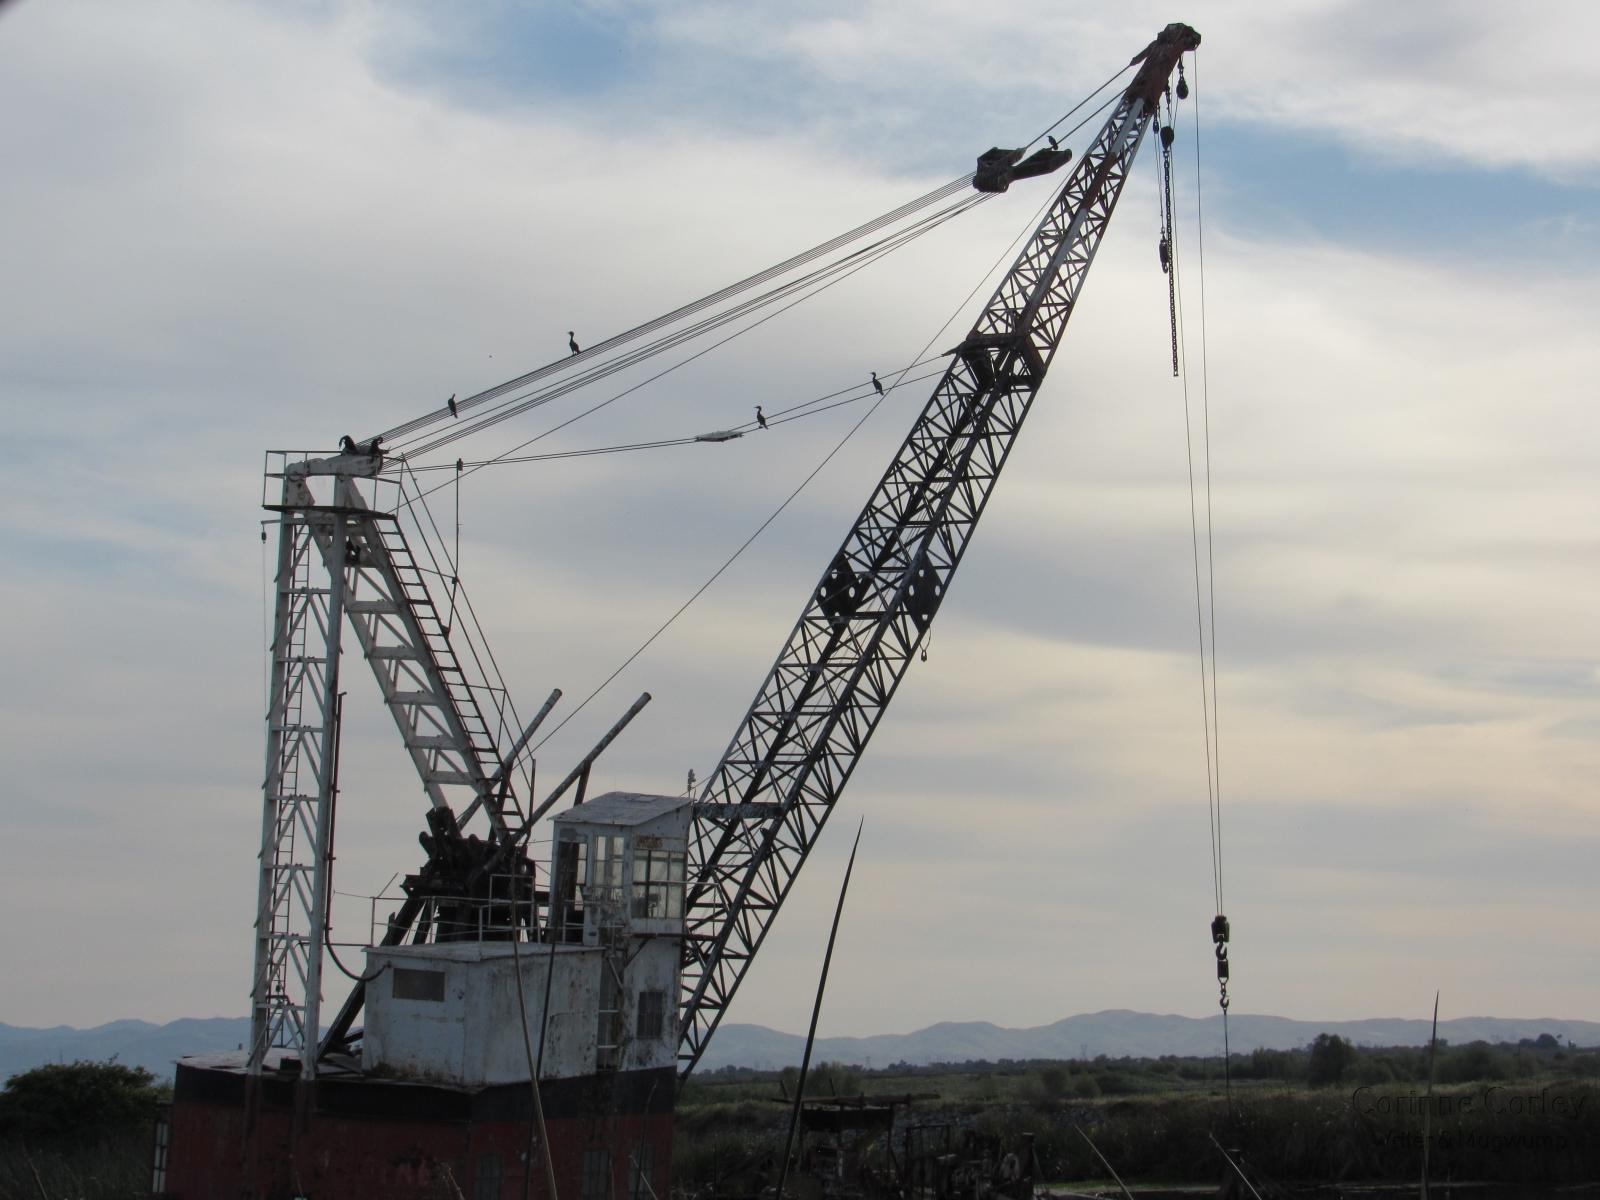 Ducks-on-the-crane